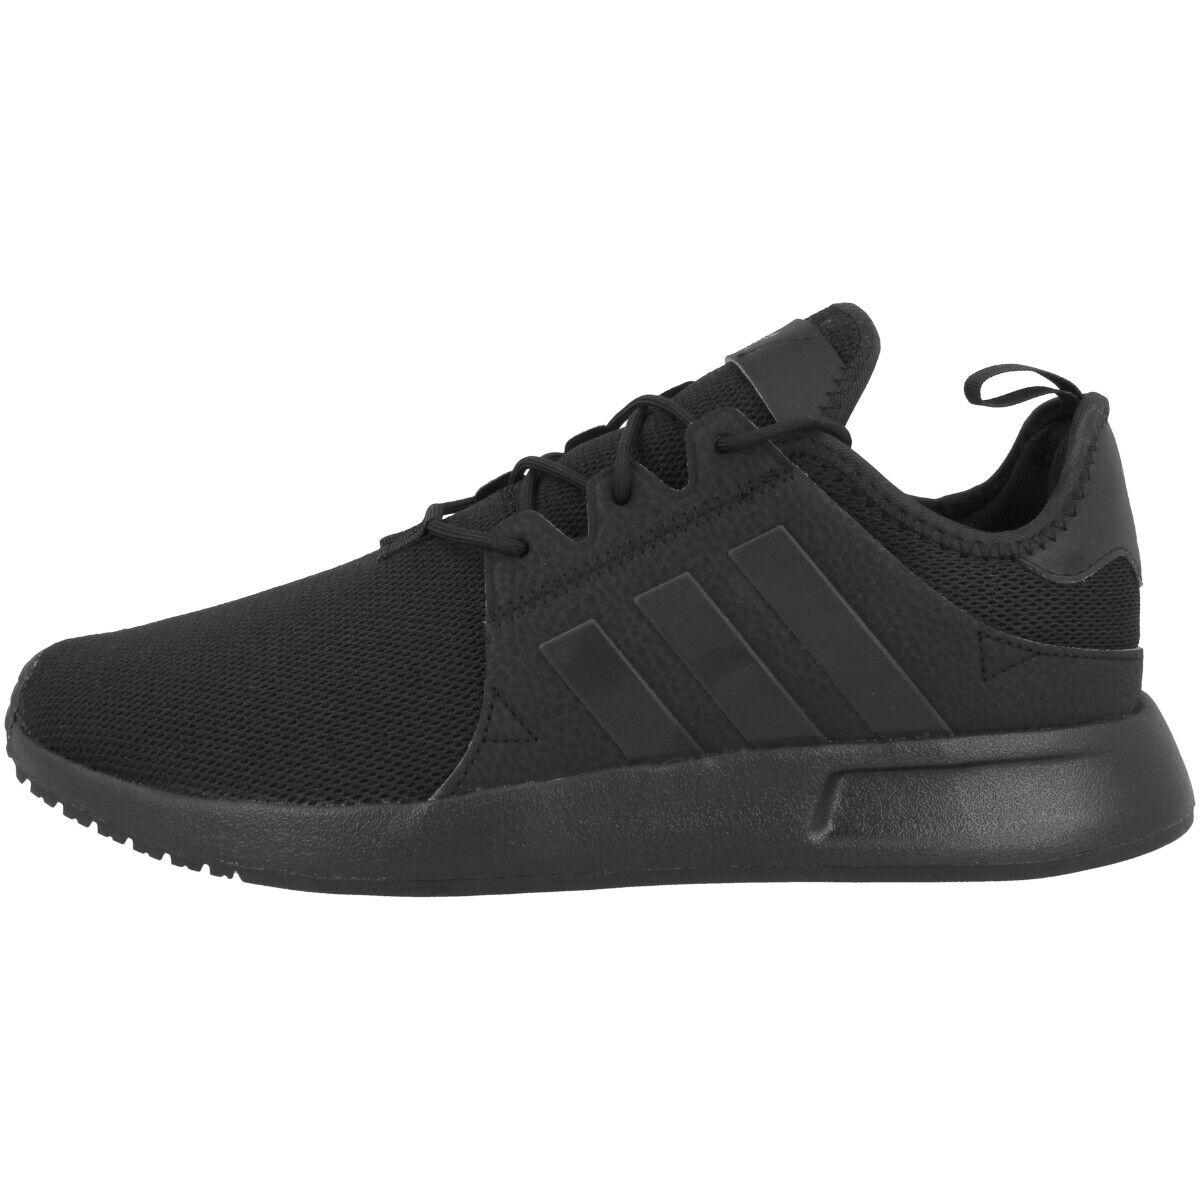 Adidas  x.'Plr Men scarpe Men's scarpe da ginnastica Running scarpe nero grigio Metallic By9260  una marca di lusso